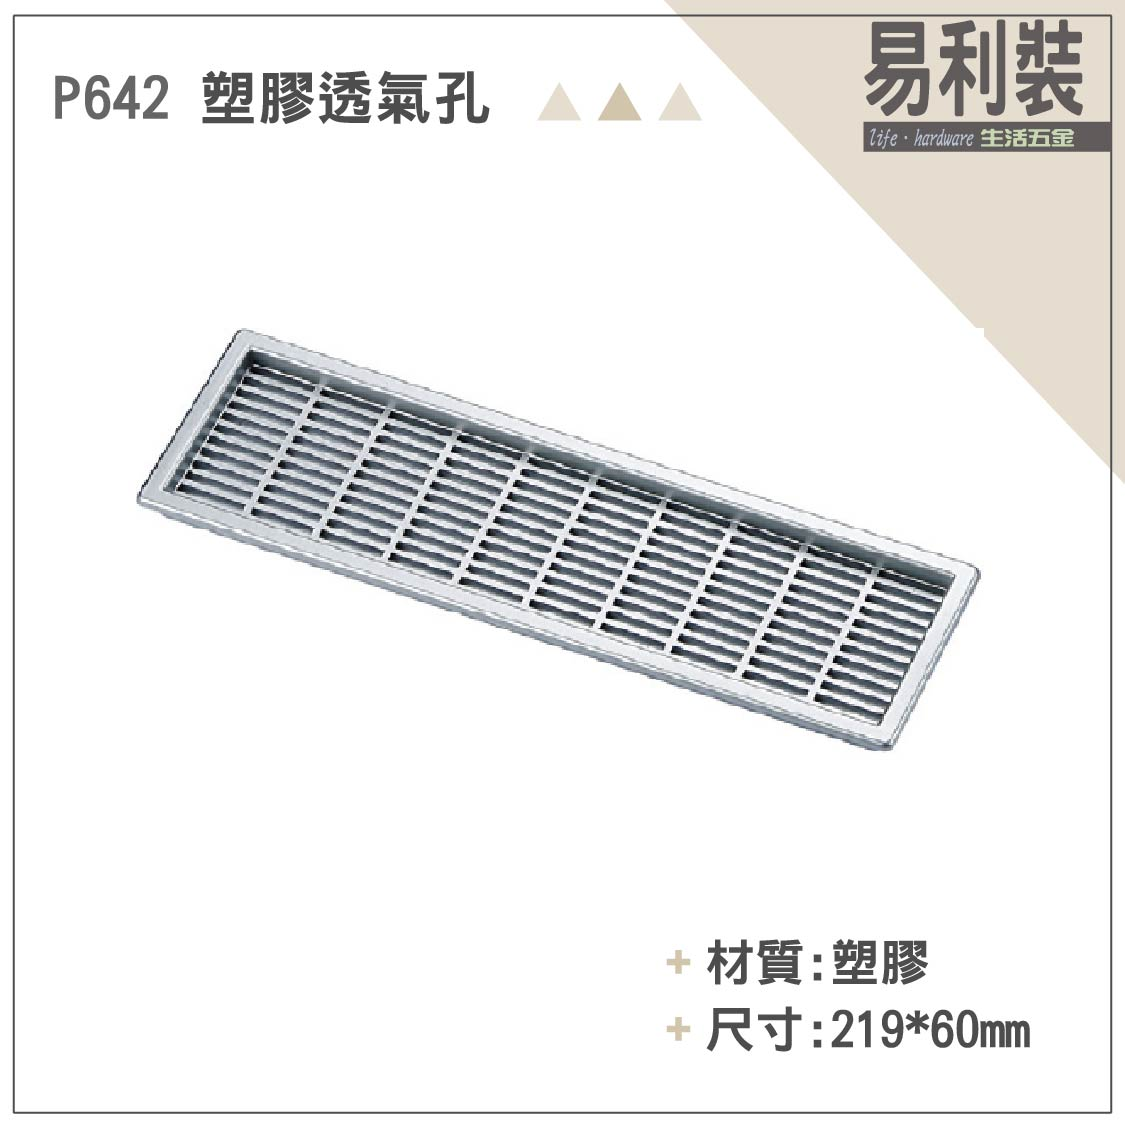 【 EASYCAN  】P642 塑膠透氣孔 易利裝生活五金 房間 臥房 客廳 餐廳 櫥櫃 衣櫃 小資族 辦公家具 系統家具